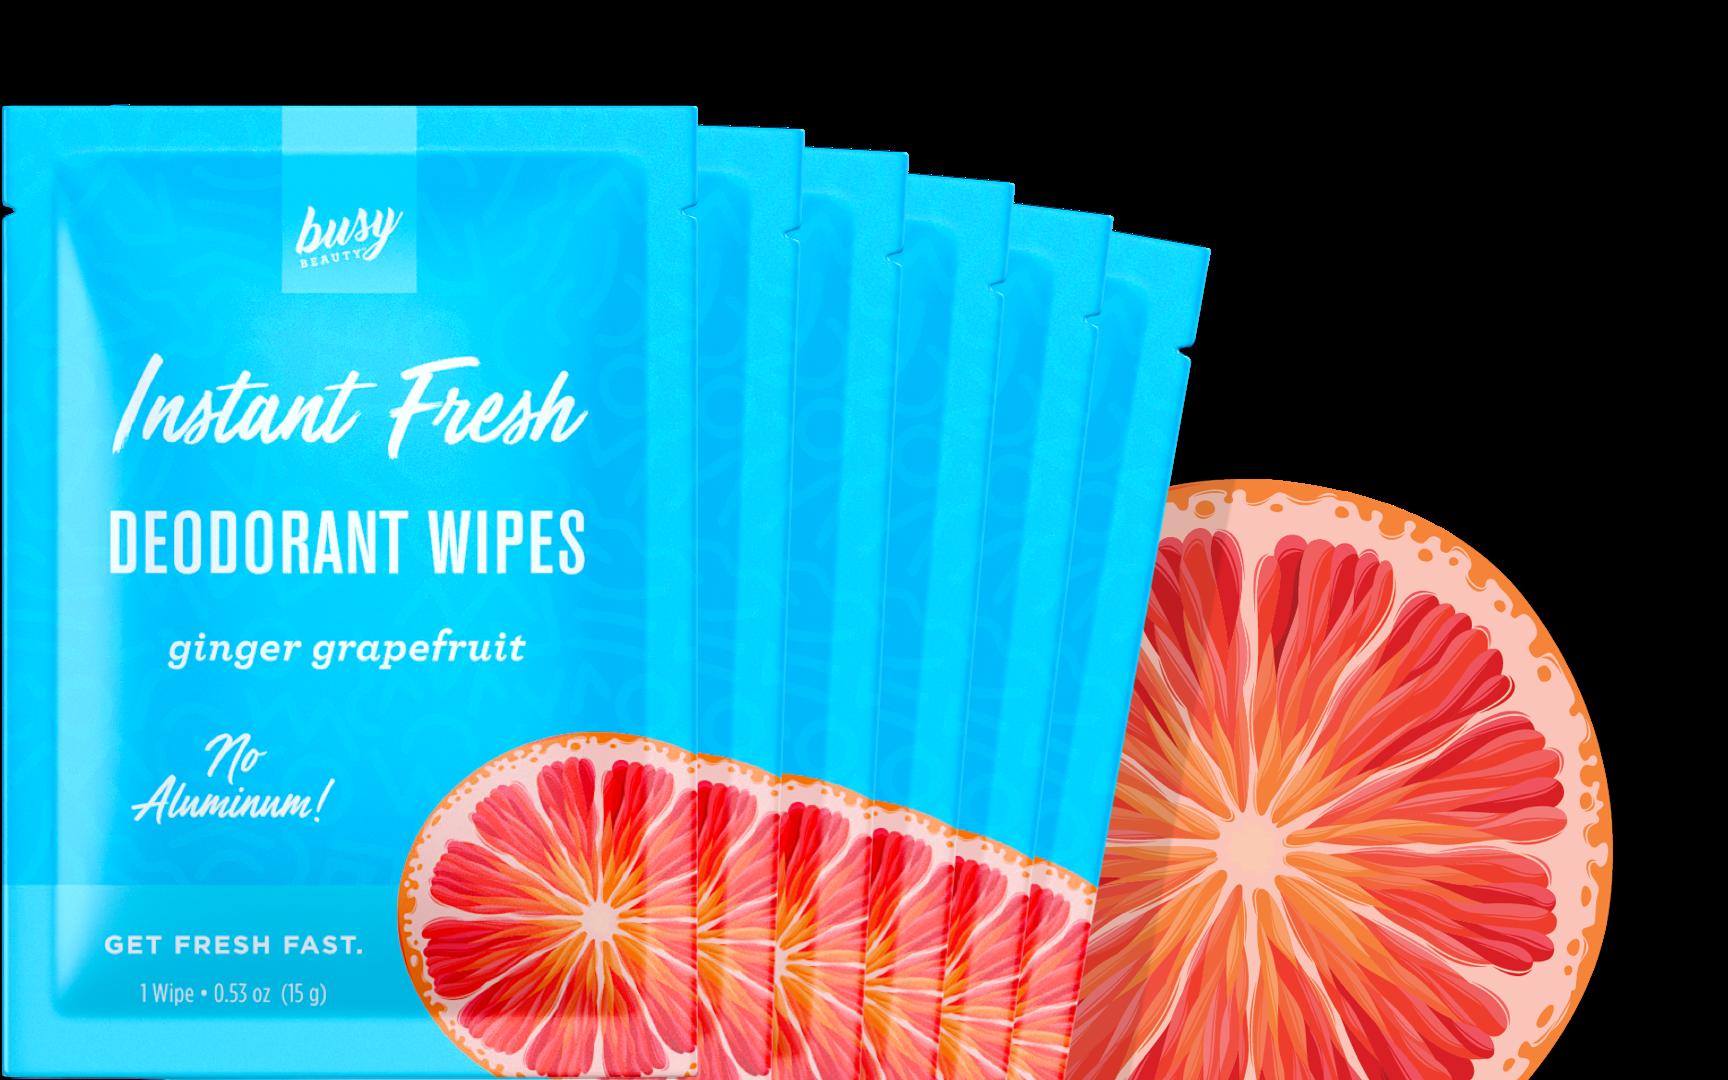 Ginger Grapefruit Deodorant Wipes